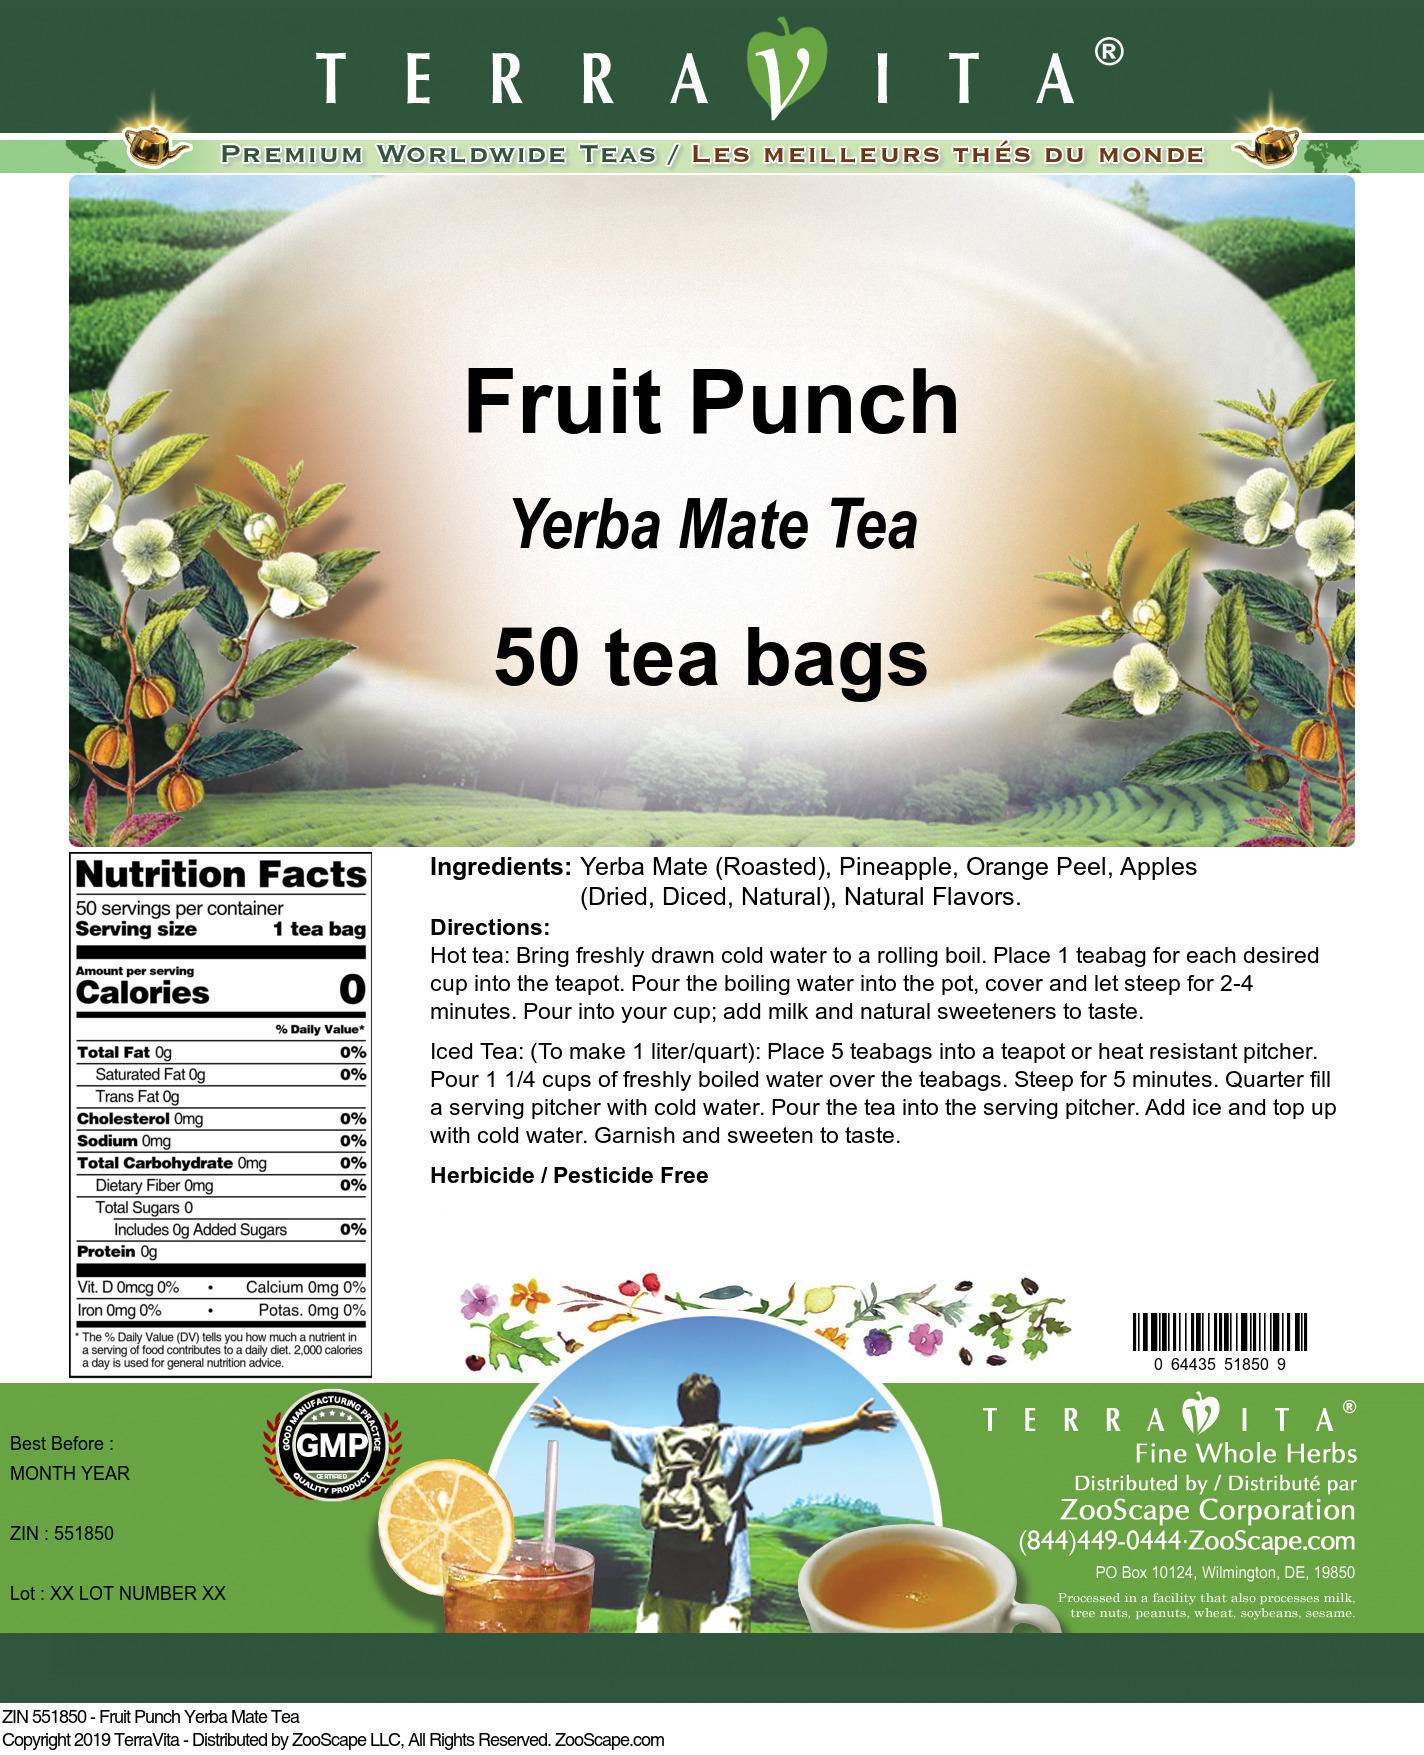 Fruit Punch Yerba Mate Tea